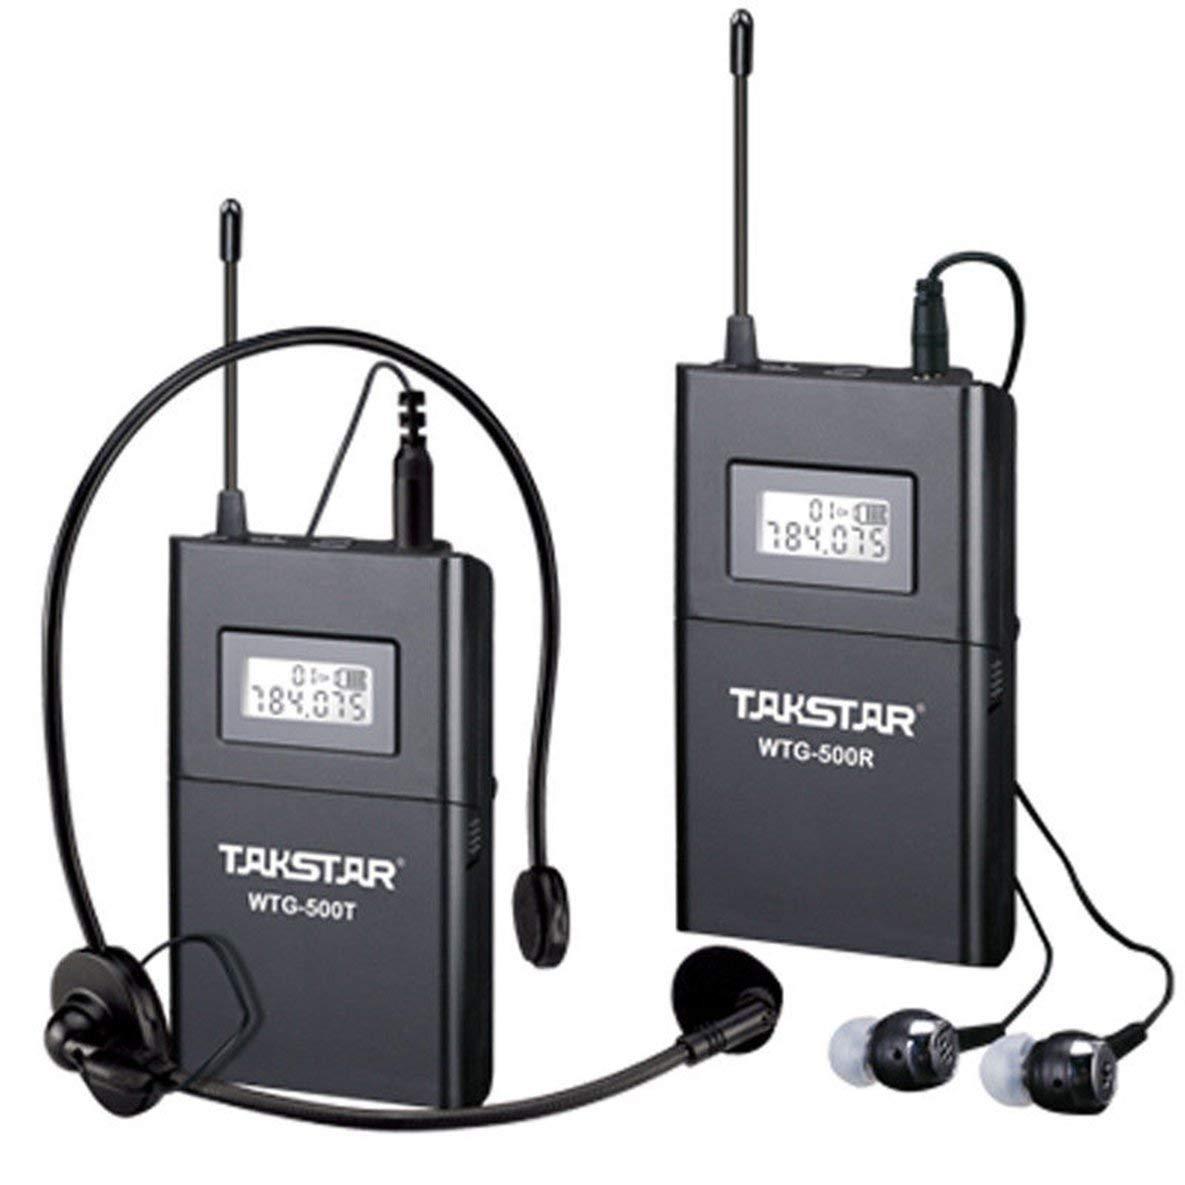 MolySun プロのWTG-500 UHFバンドツアーガイド教育用UHF無線システム機器1送信機1受信機黒 黒 B07P19VR8X